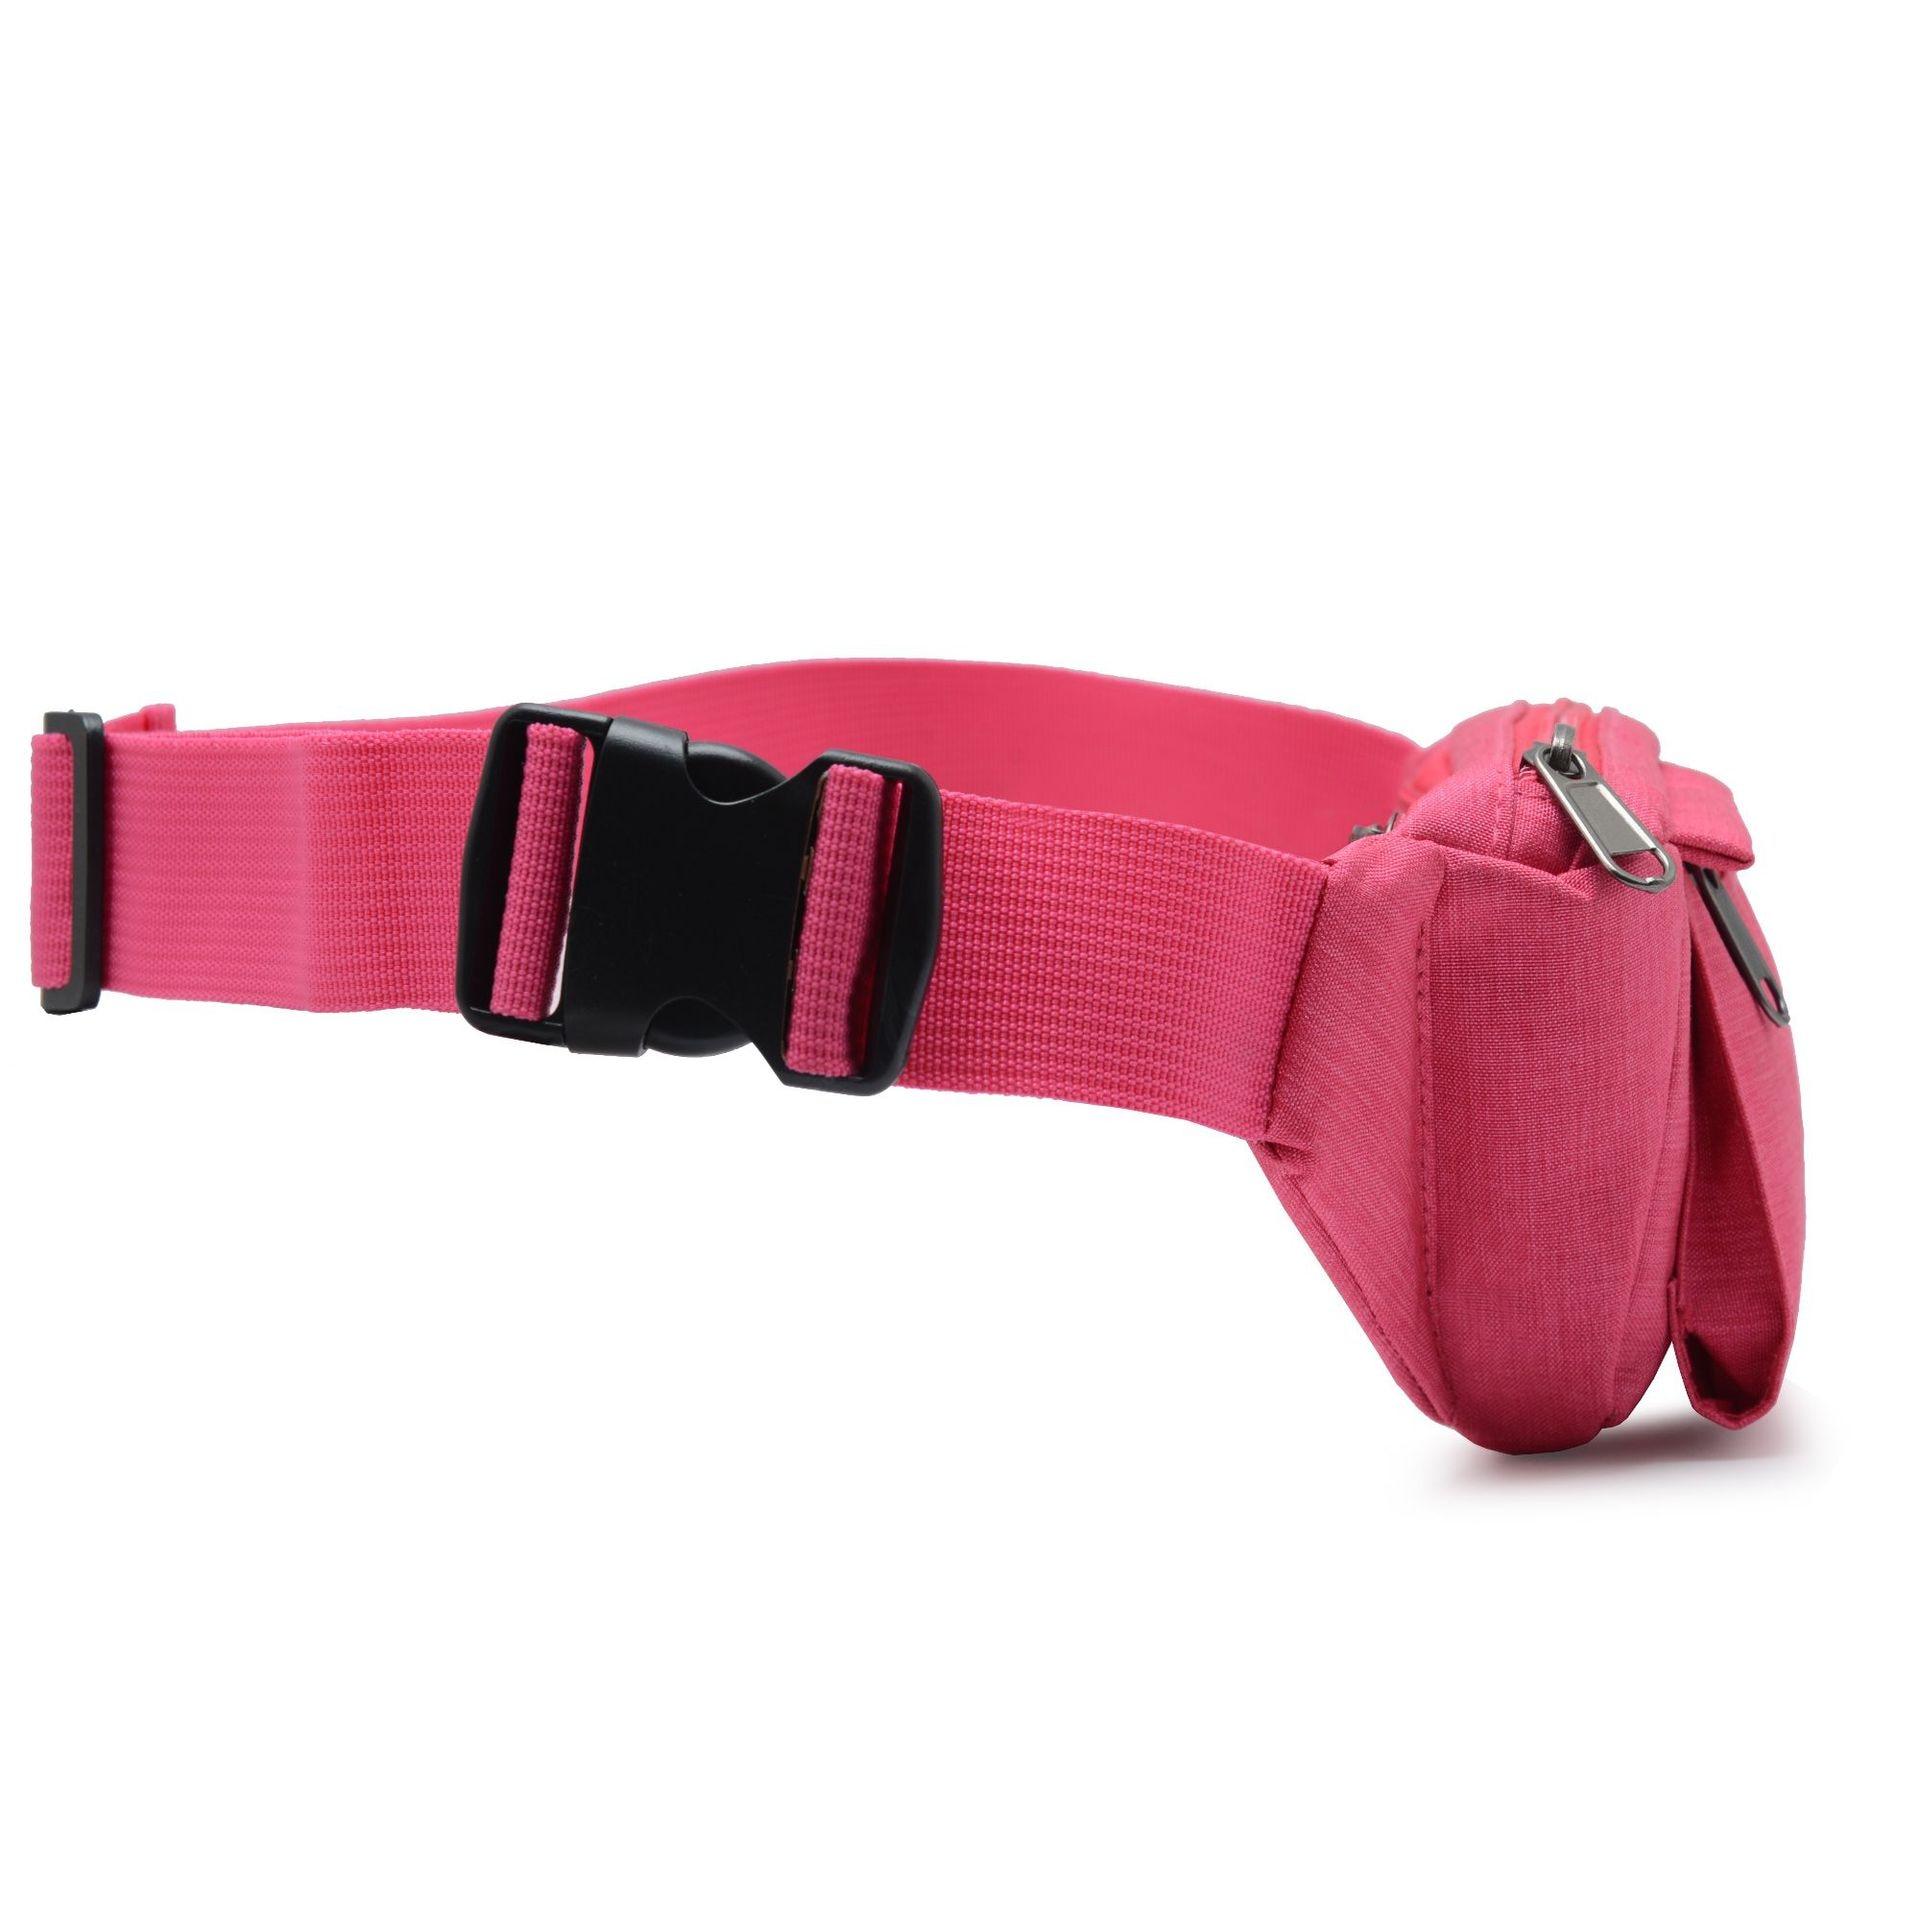 Waterproof Waist Pack Multi-functional Men And Women-Sports Mobile Phone Belt Bag Fitness Equipment Money Business Bag Thin